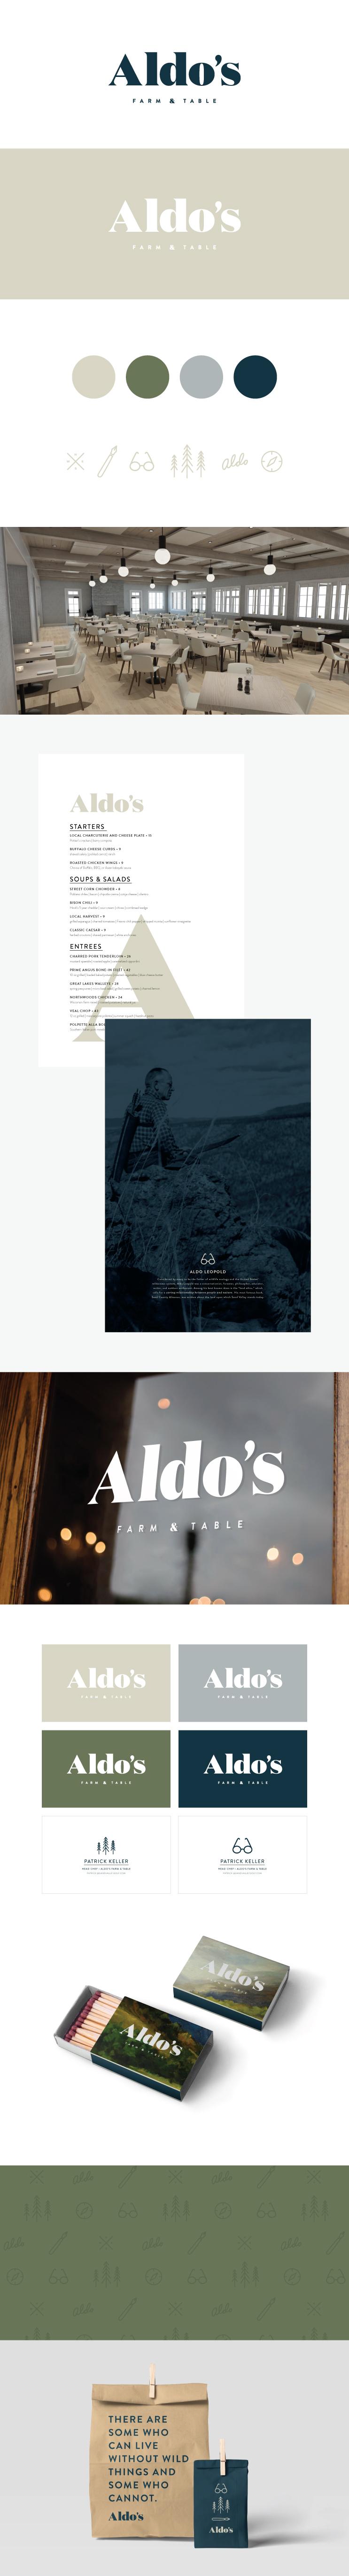 Olivia-Herrick-Design-Aldos-Farm-Table.jpg